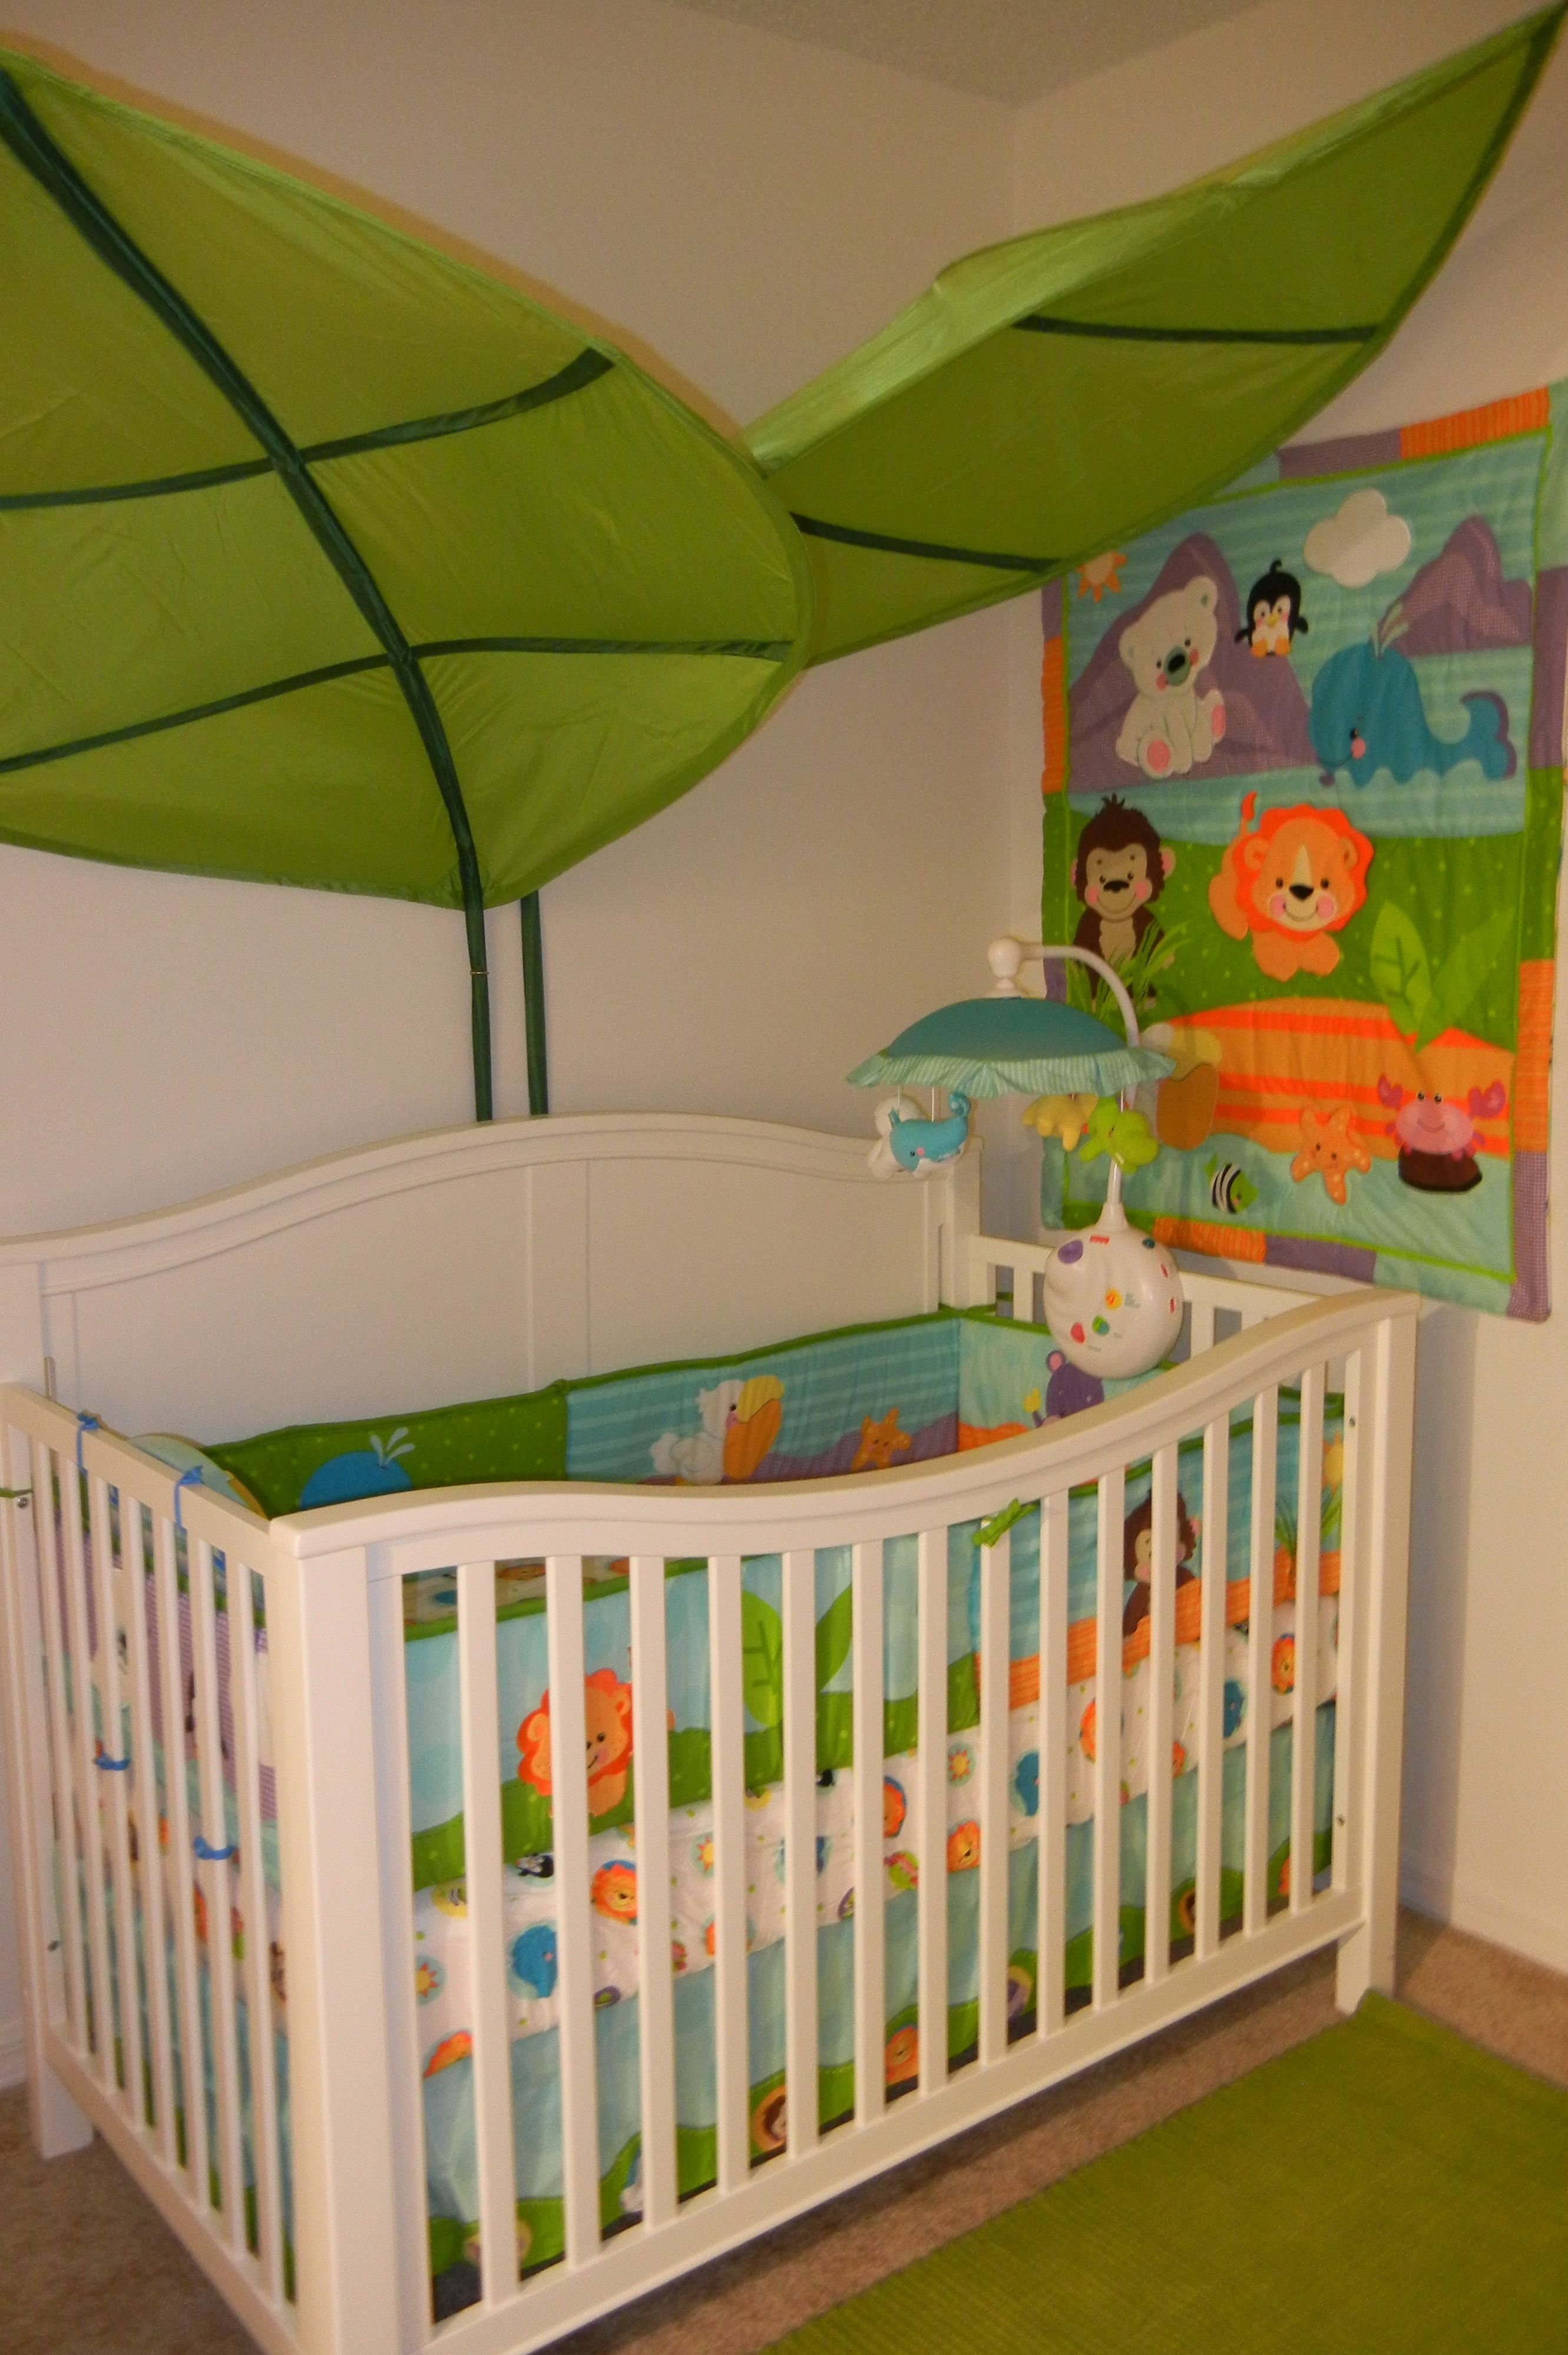 Precious Planet Bedding u0026 IKEA Leaves Canopy & Precious Planet Bedding u0026 IKEA Leaves Canopy | a DIY home: Kids ...